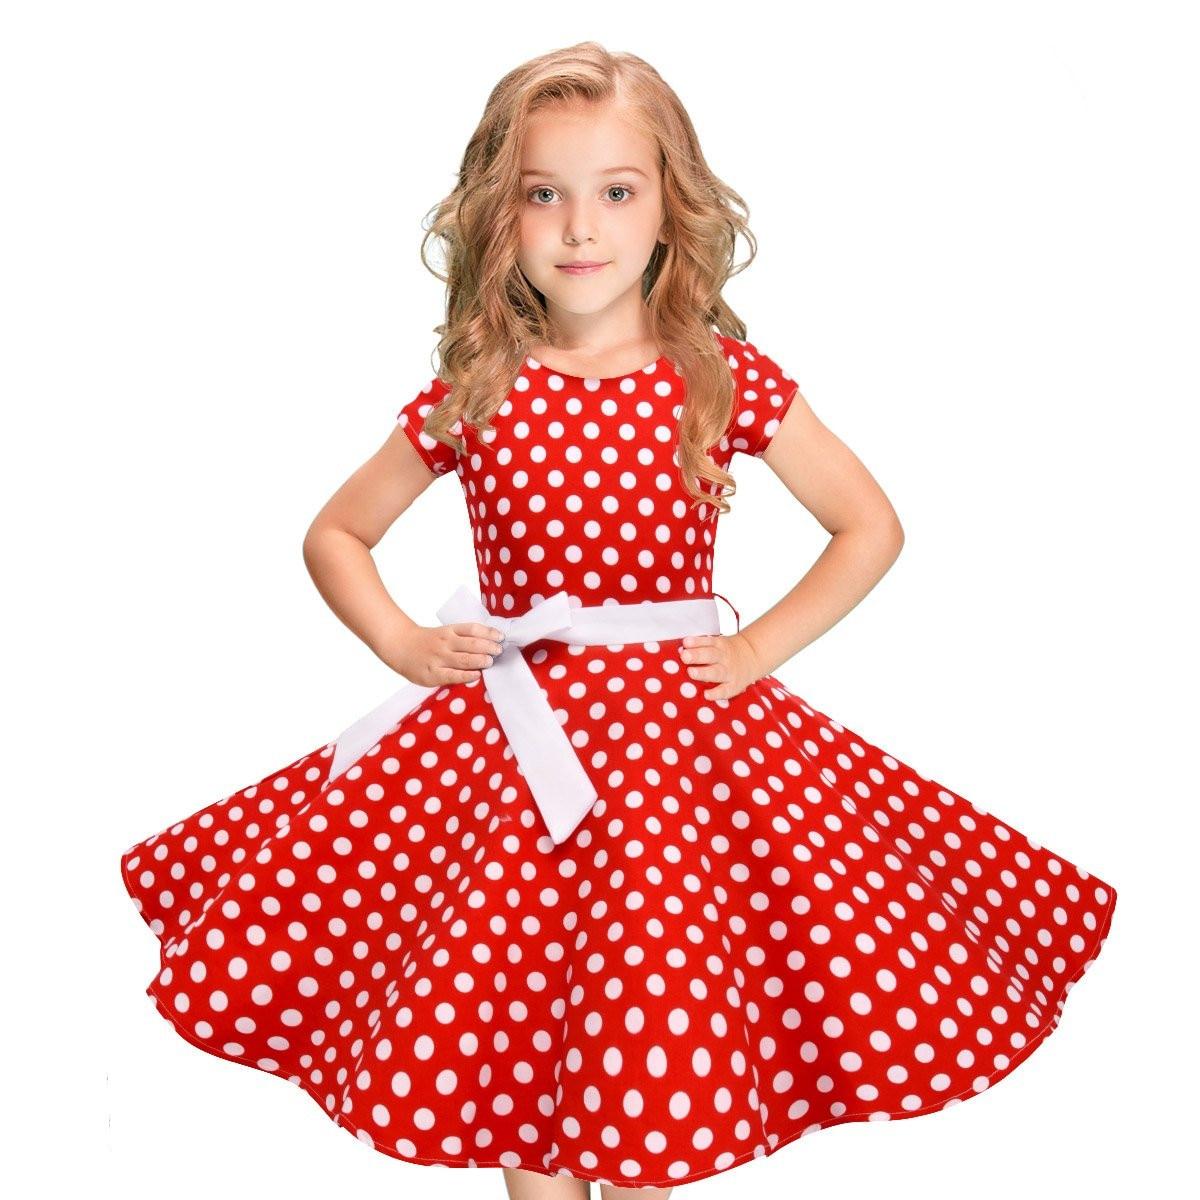 6ae18ba9baa21 US $4.4 37% OFF|Summer New Fashion Kids Girls Vintage Dress Polka Dot  Princess Swing Rockabilly Party Daily Dresses Wholesale Free Ship Z4-in  Dresses ...